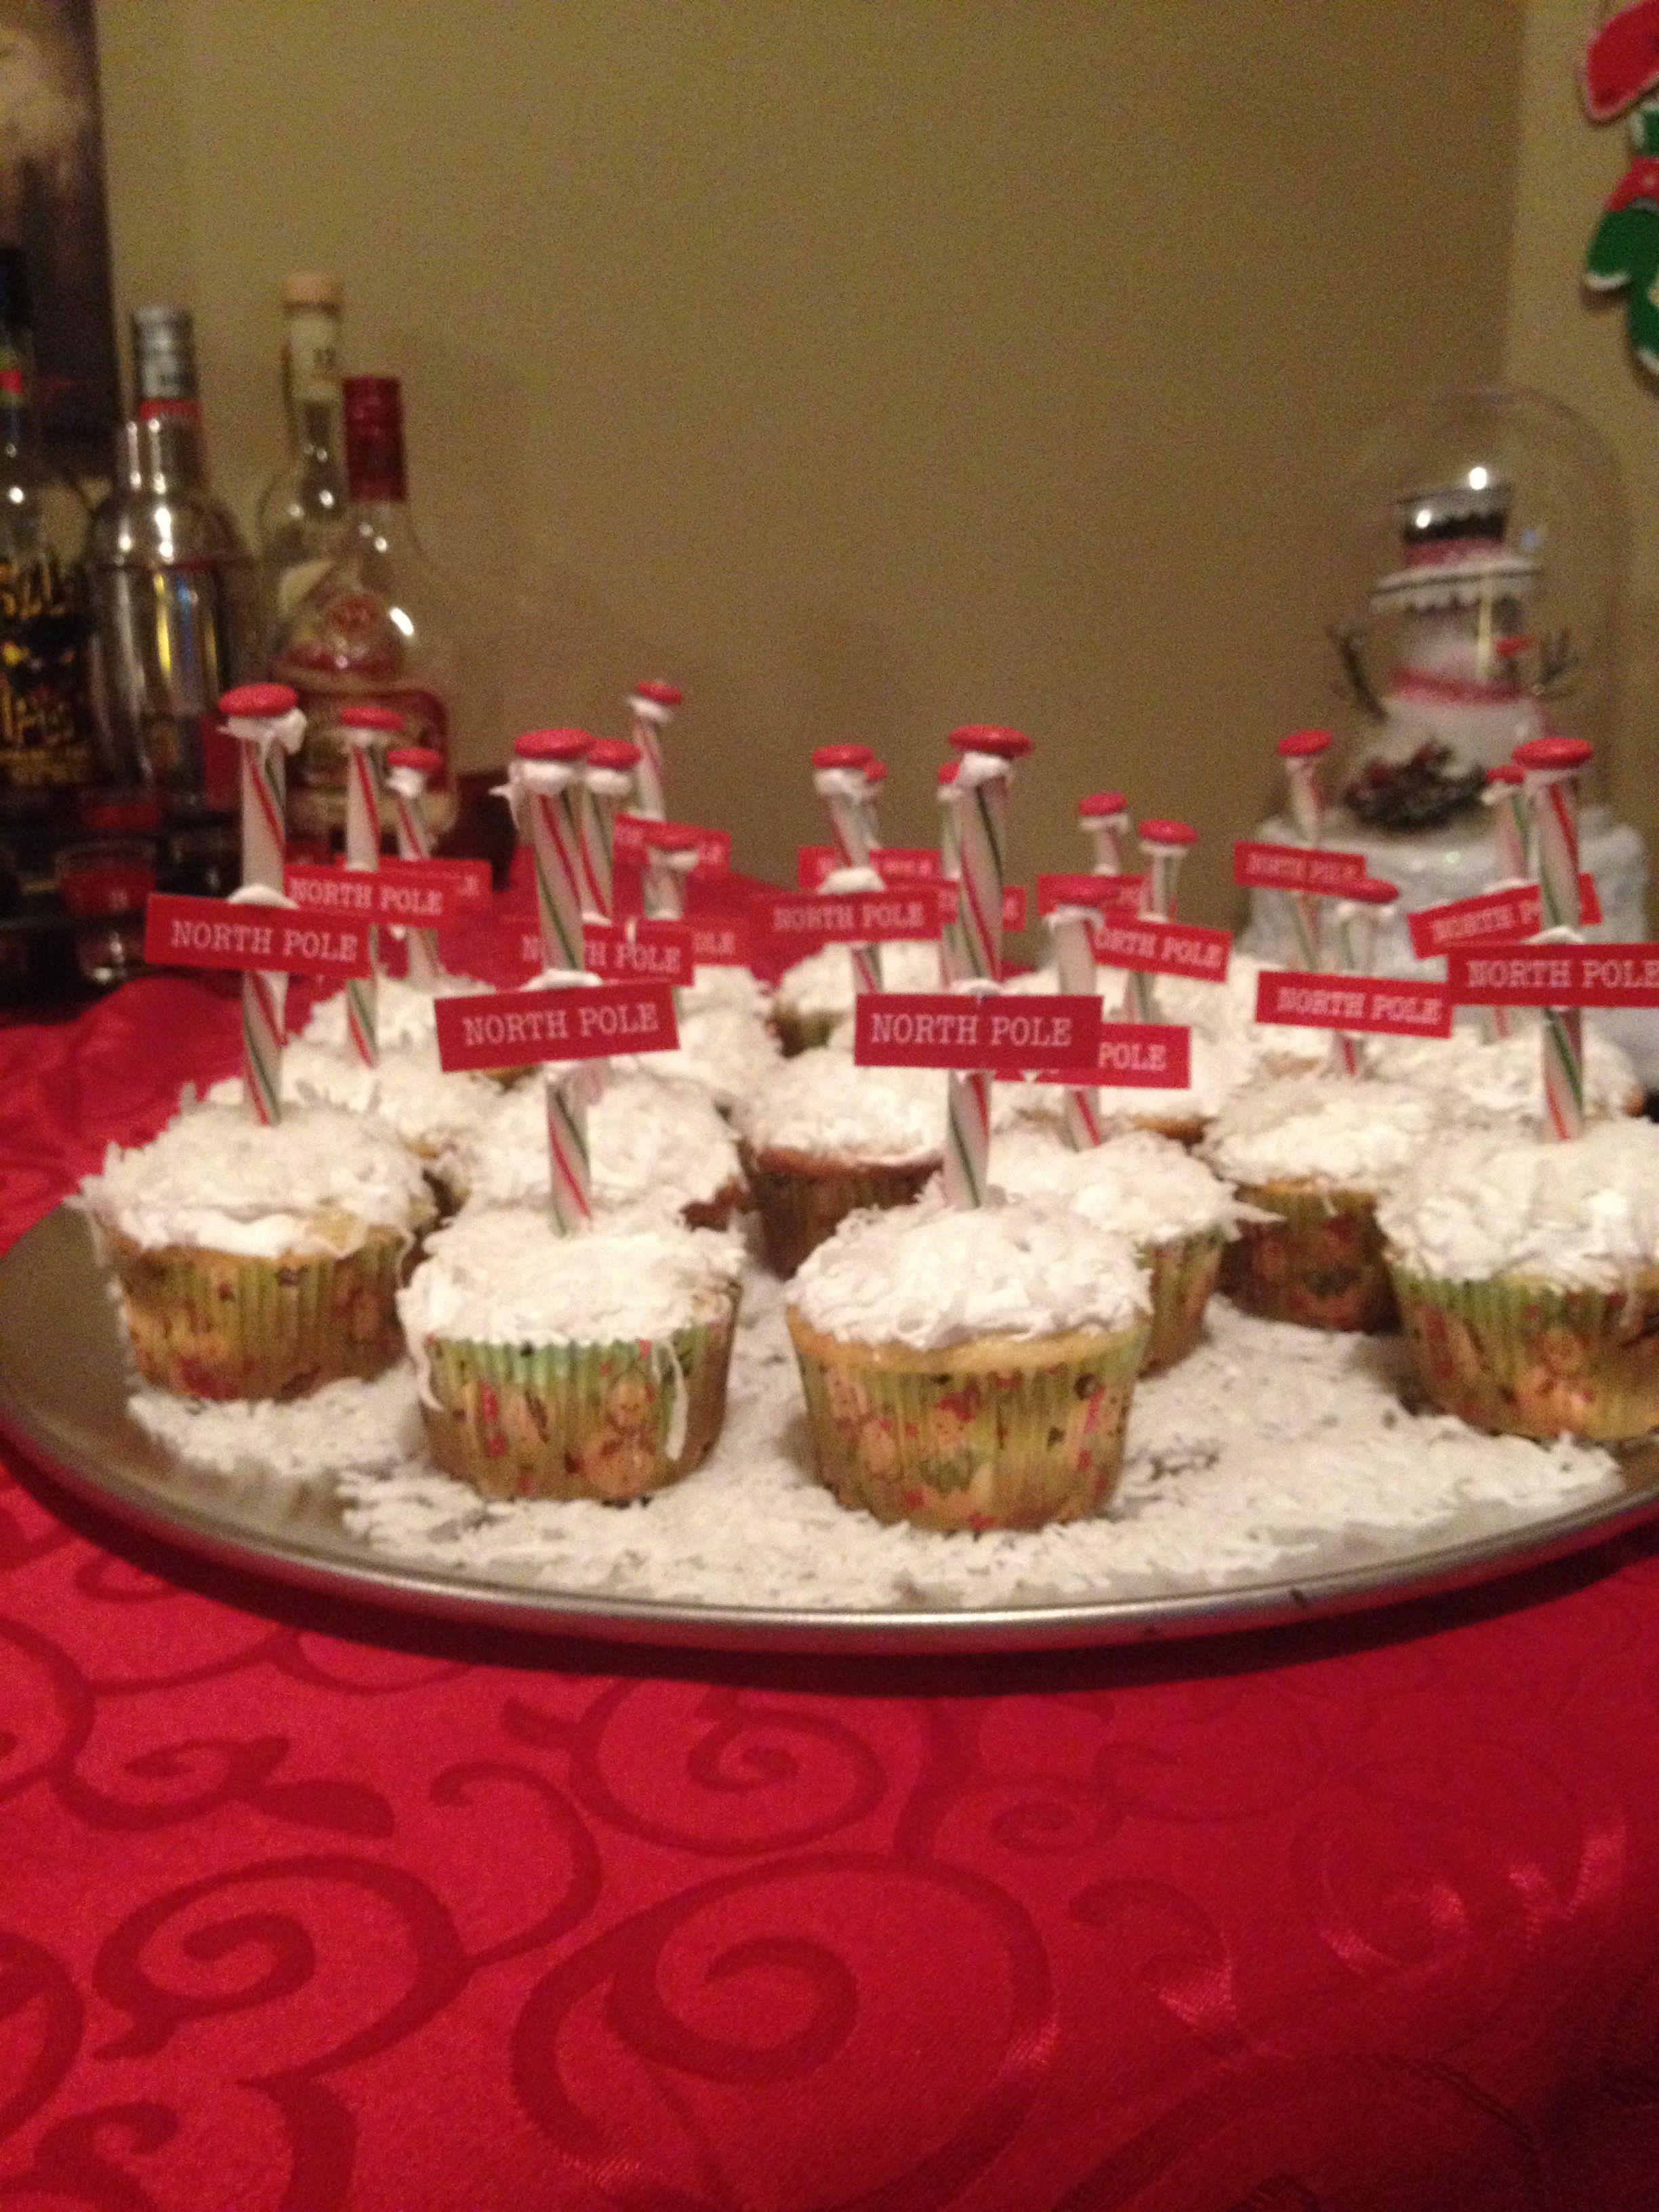 Successful Pinterest attempt I think :) gotta love cupcakes!!